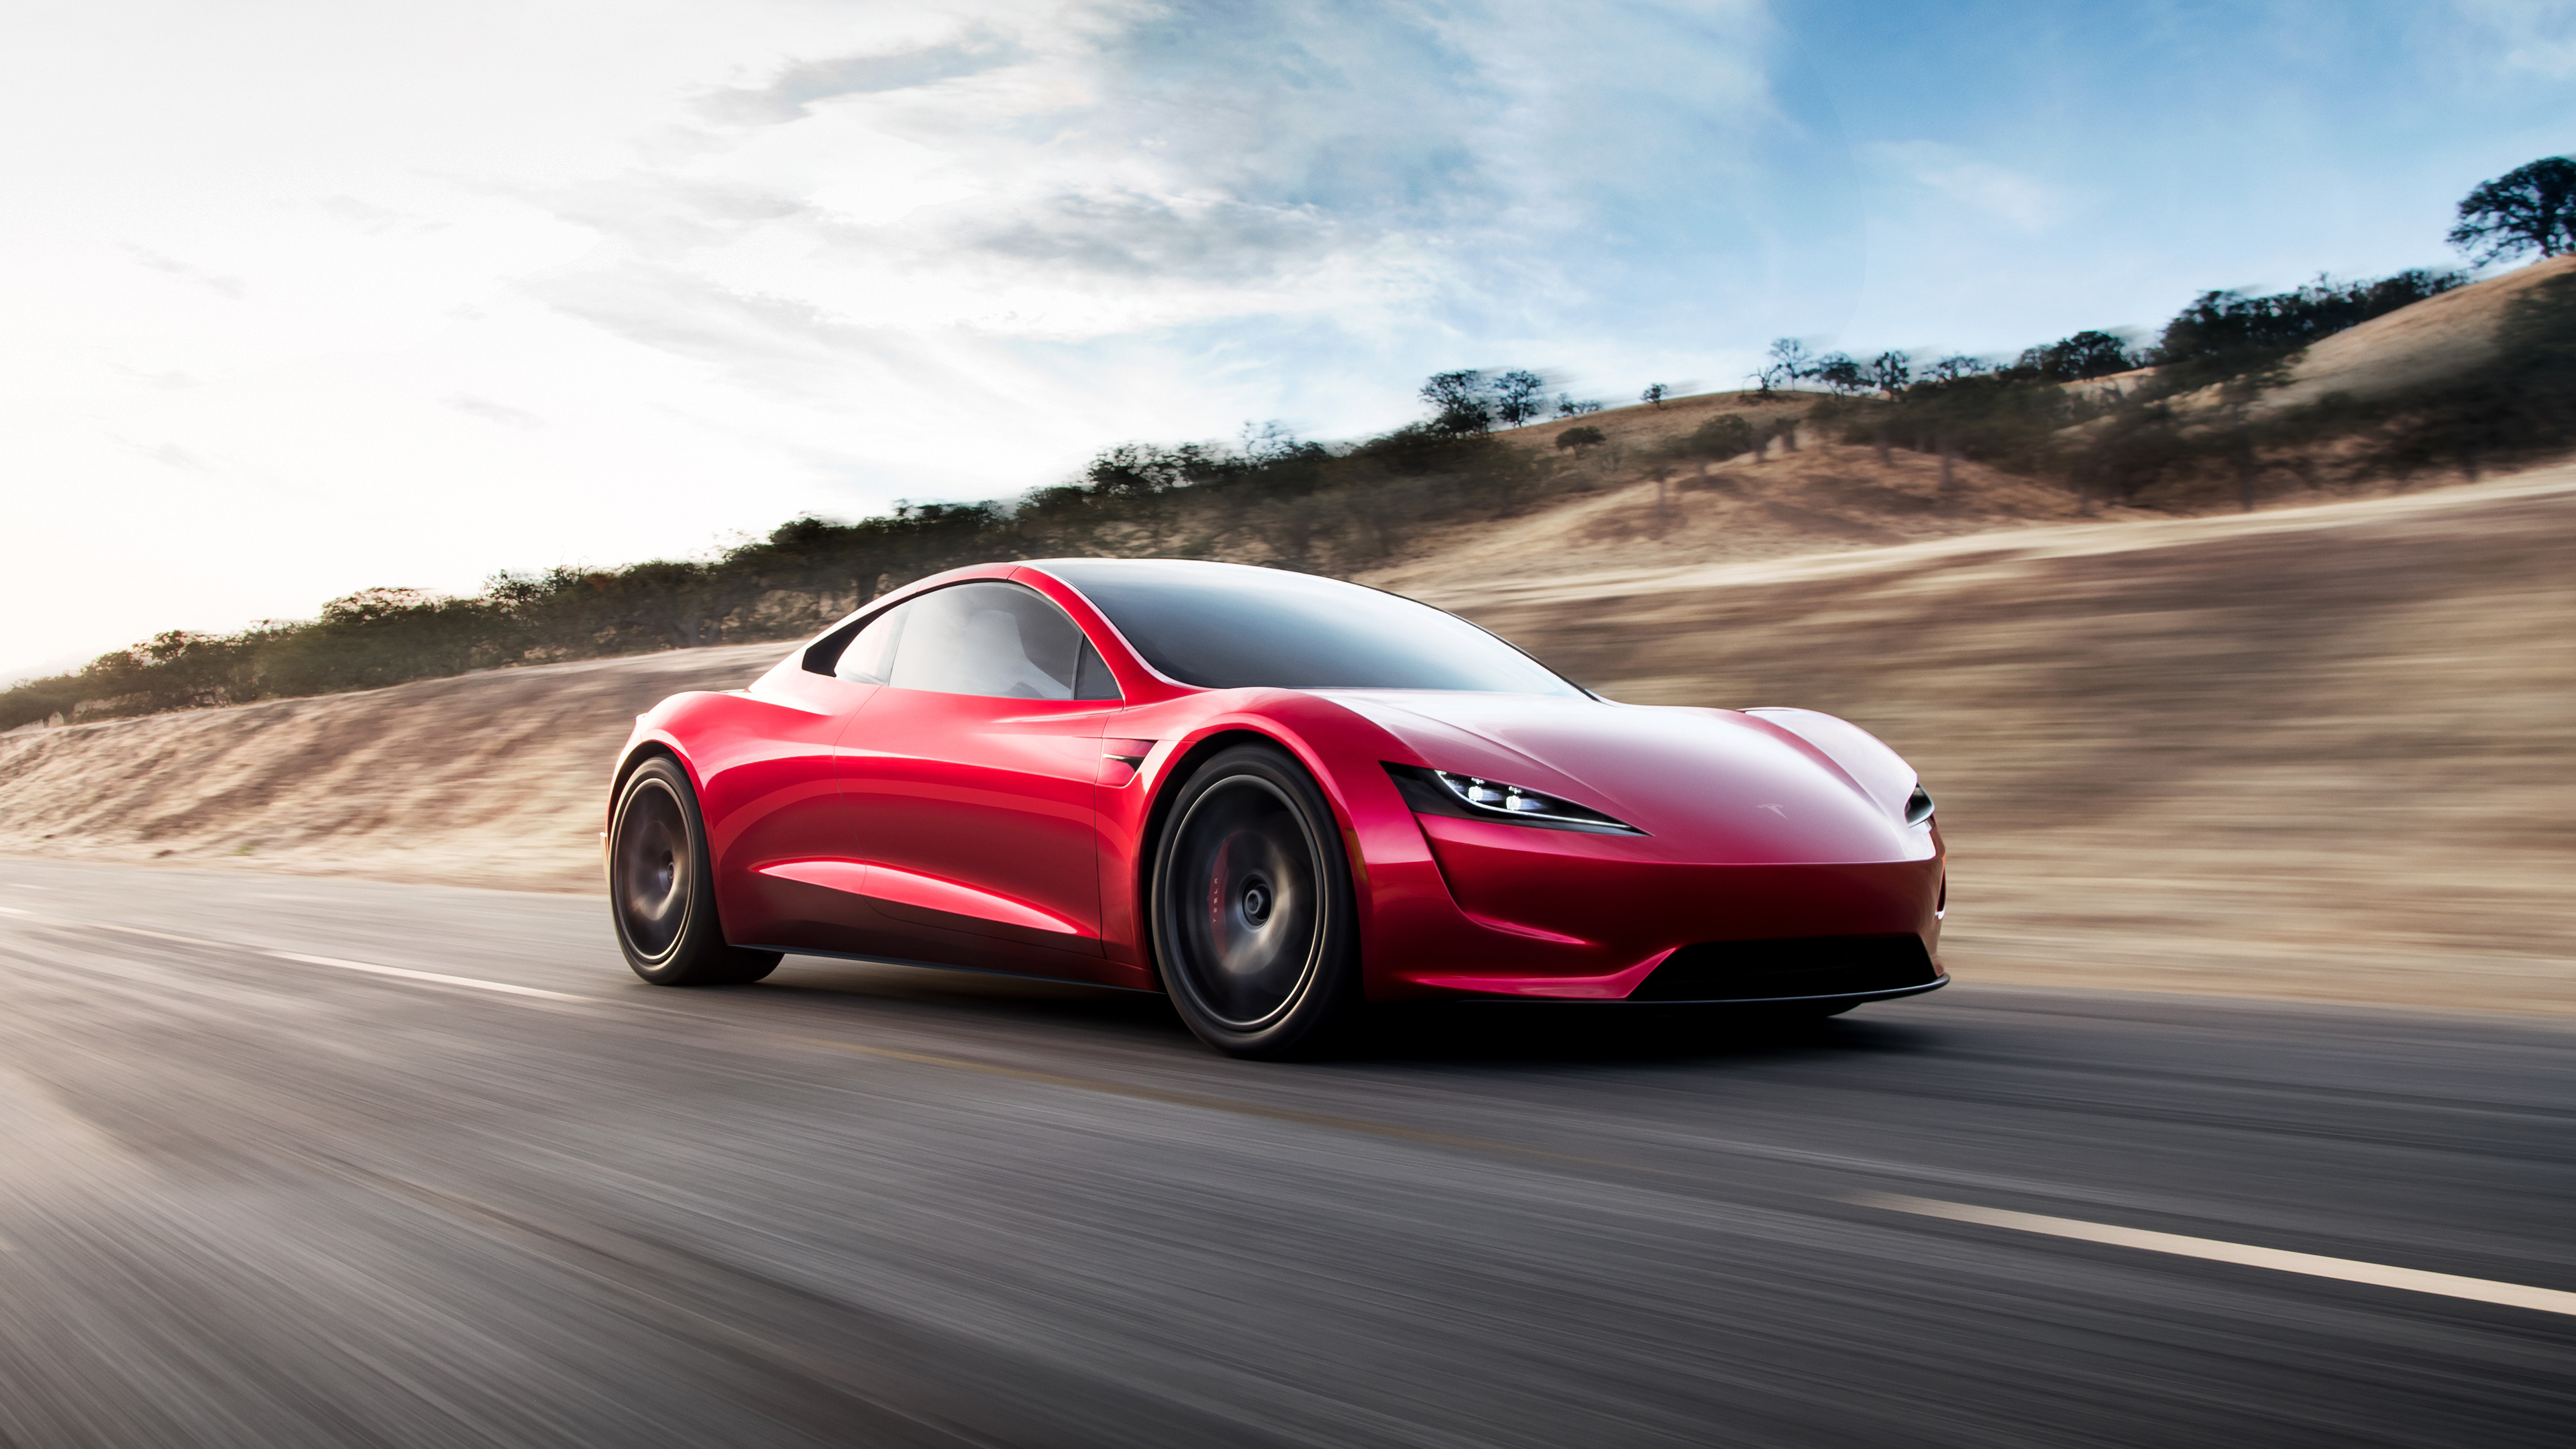 tesla roadster 4k 1539108007 - Tesla Roadster 4k - tesla wallpapers, tesla roadster wallpapers, hd-wallpapers, electric cars wallpapers, 4k-wallpapers, 2018 cars wallpapers